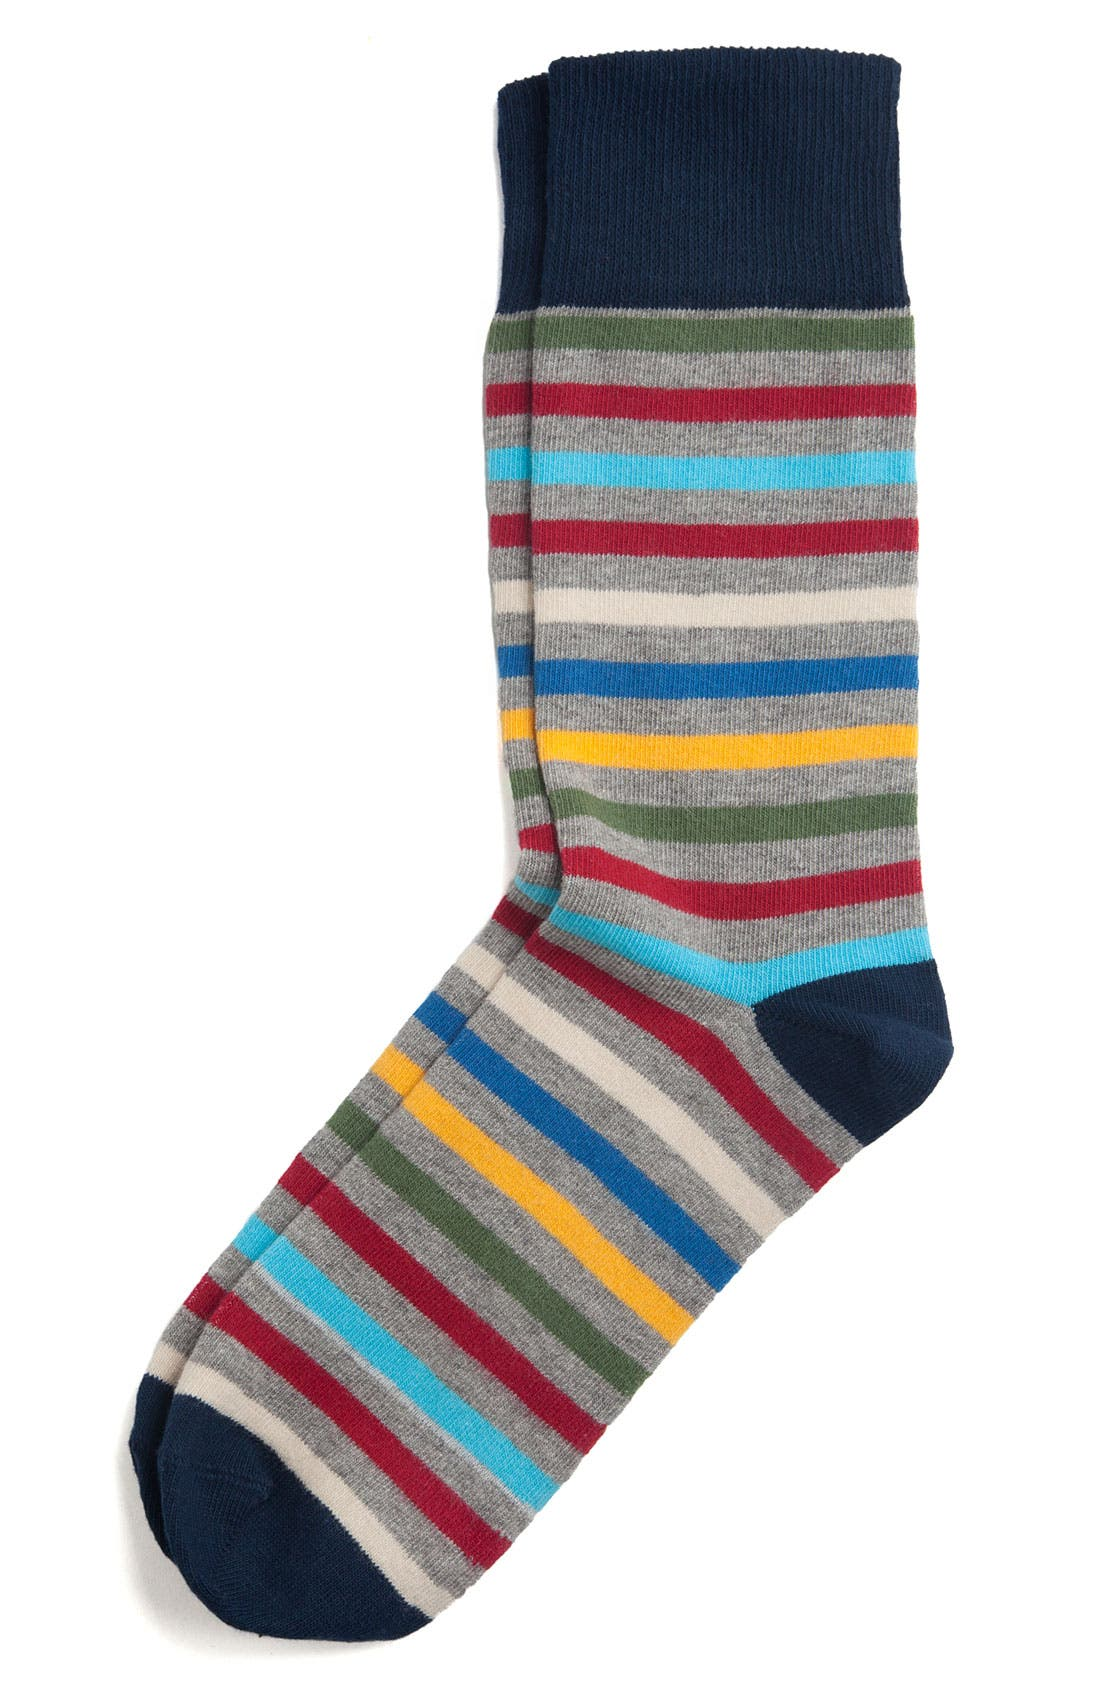 Main Image - Pact Multicolored Stripe Socks